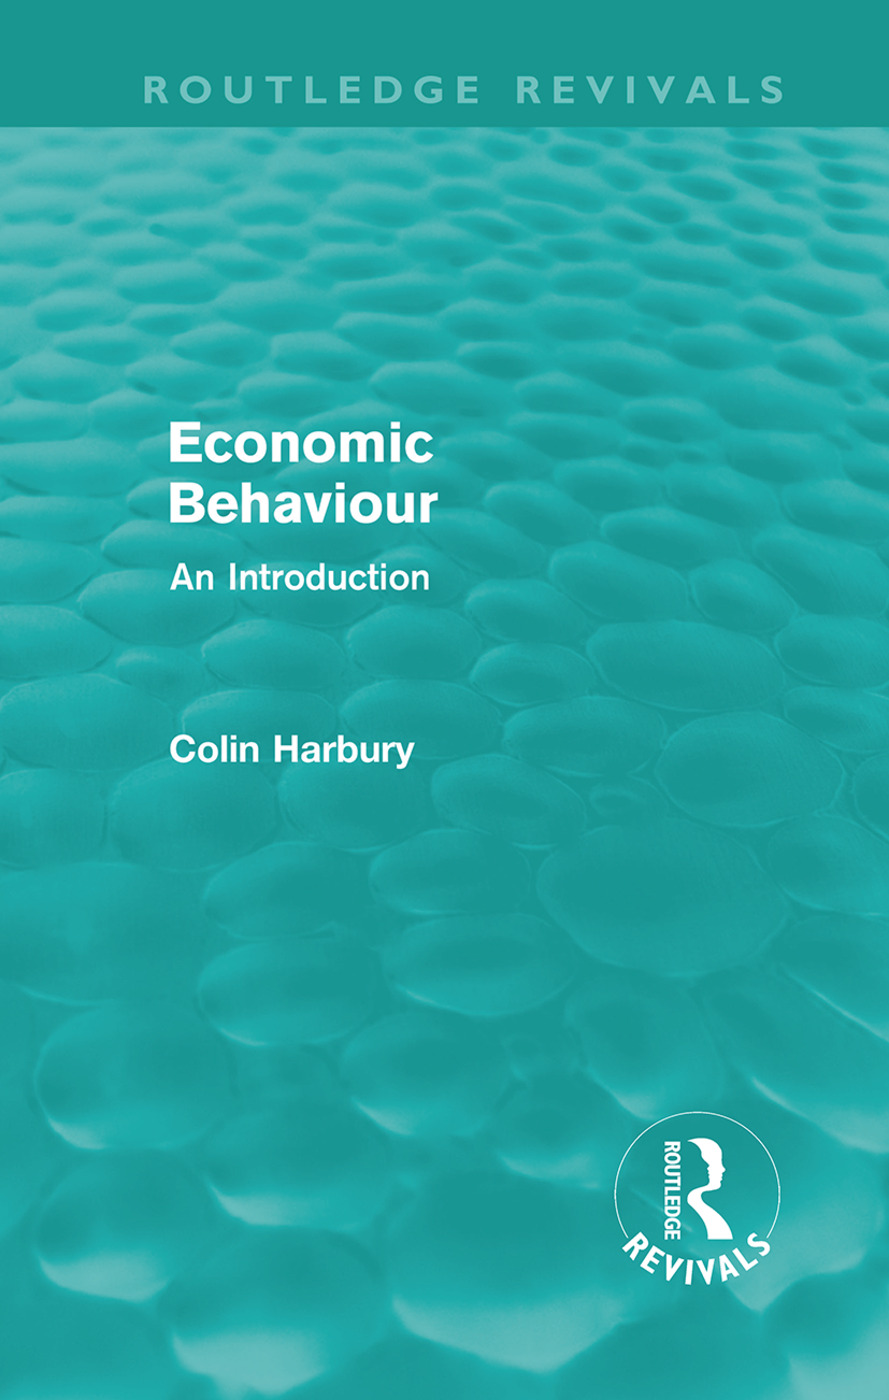 Economic Behaviour (Routledge Revivals): An Introduction (Hardback) book cover